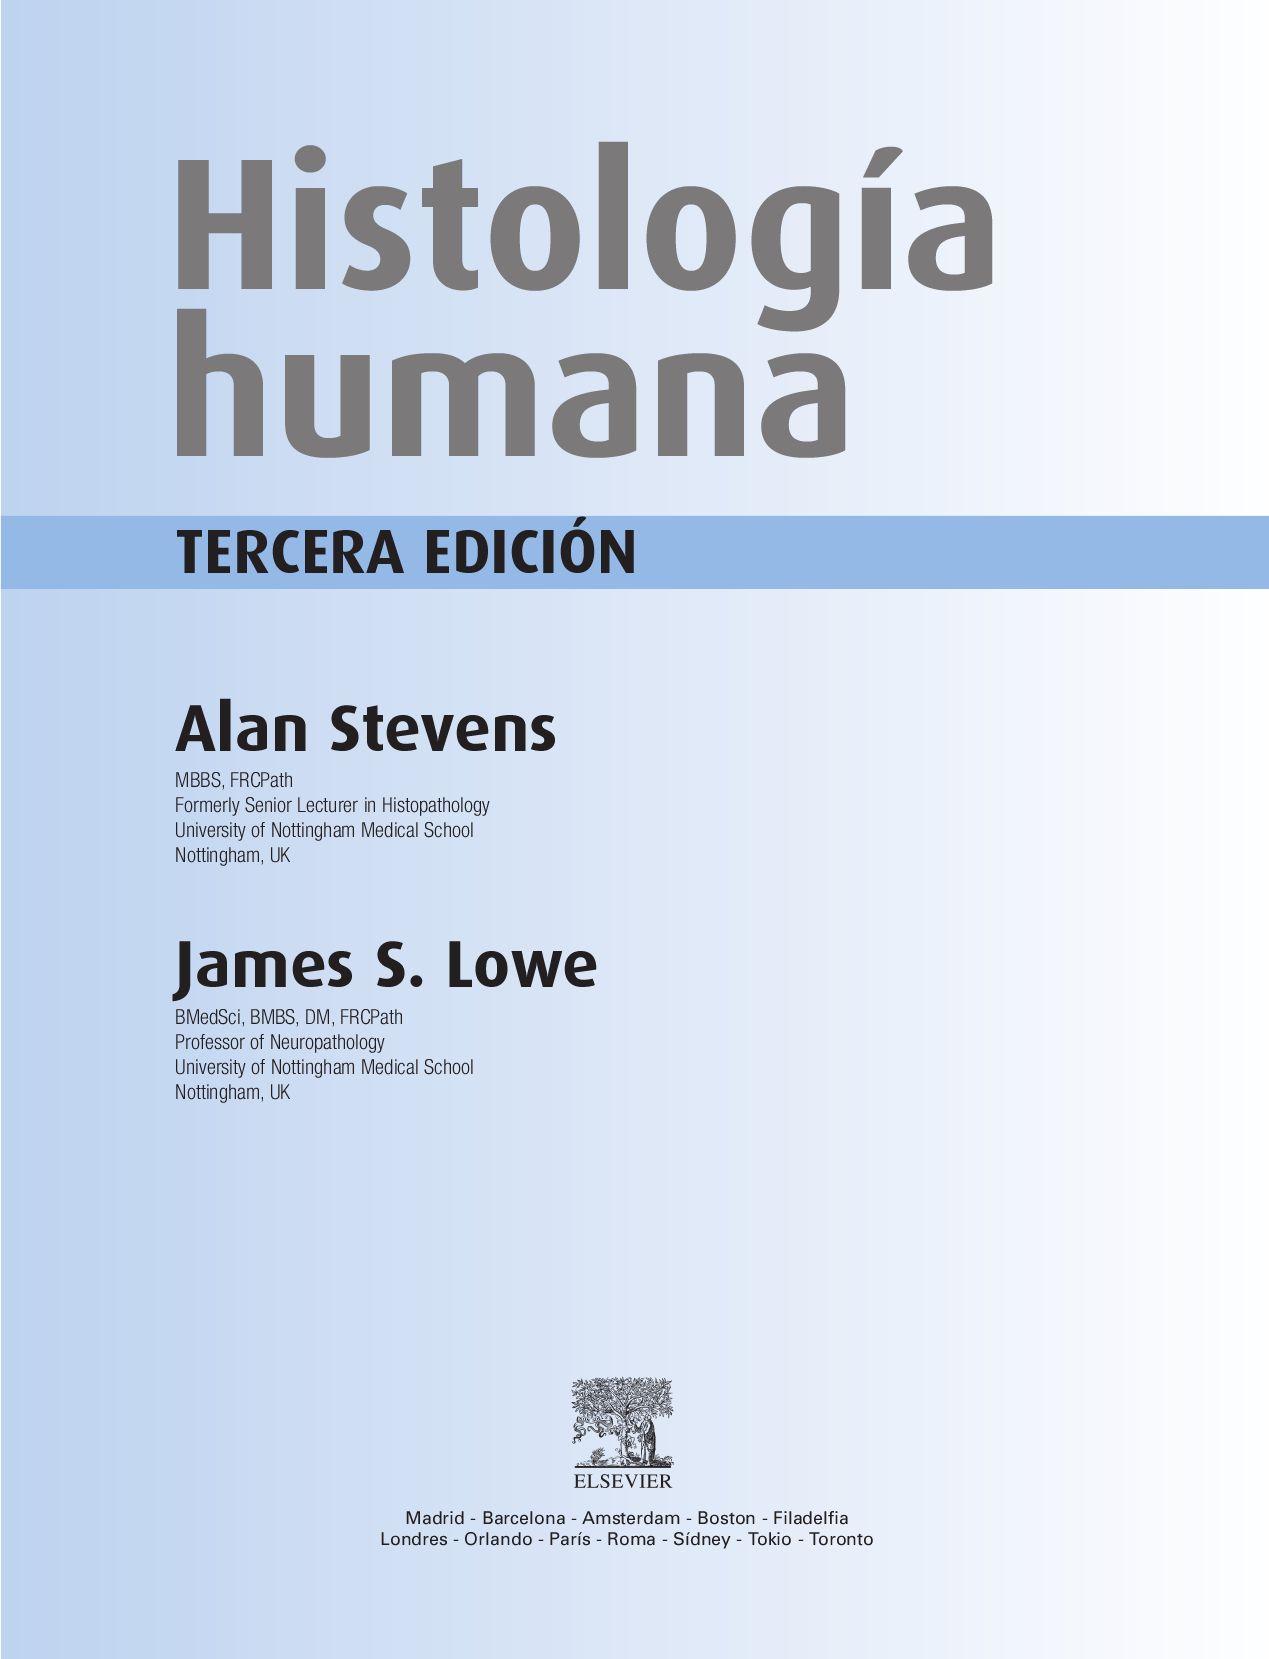 Histología Humana + Student Consult by Grupo Asís, S.L. - issuu